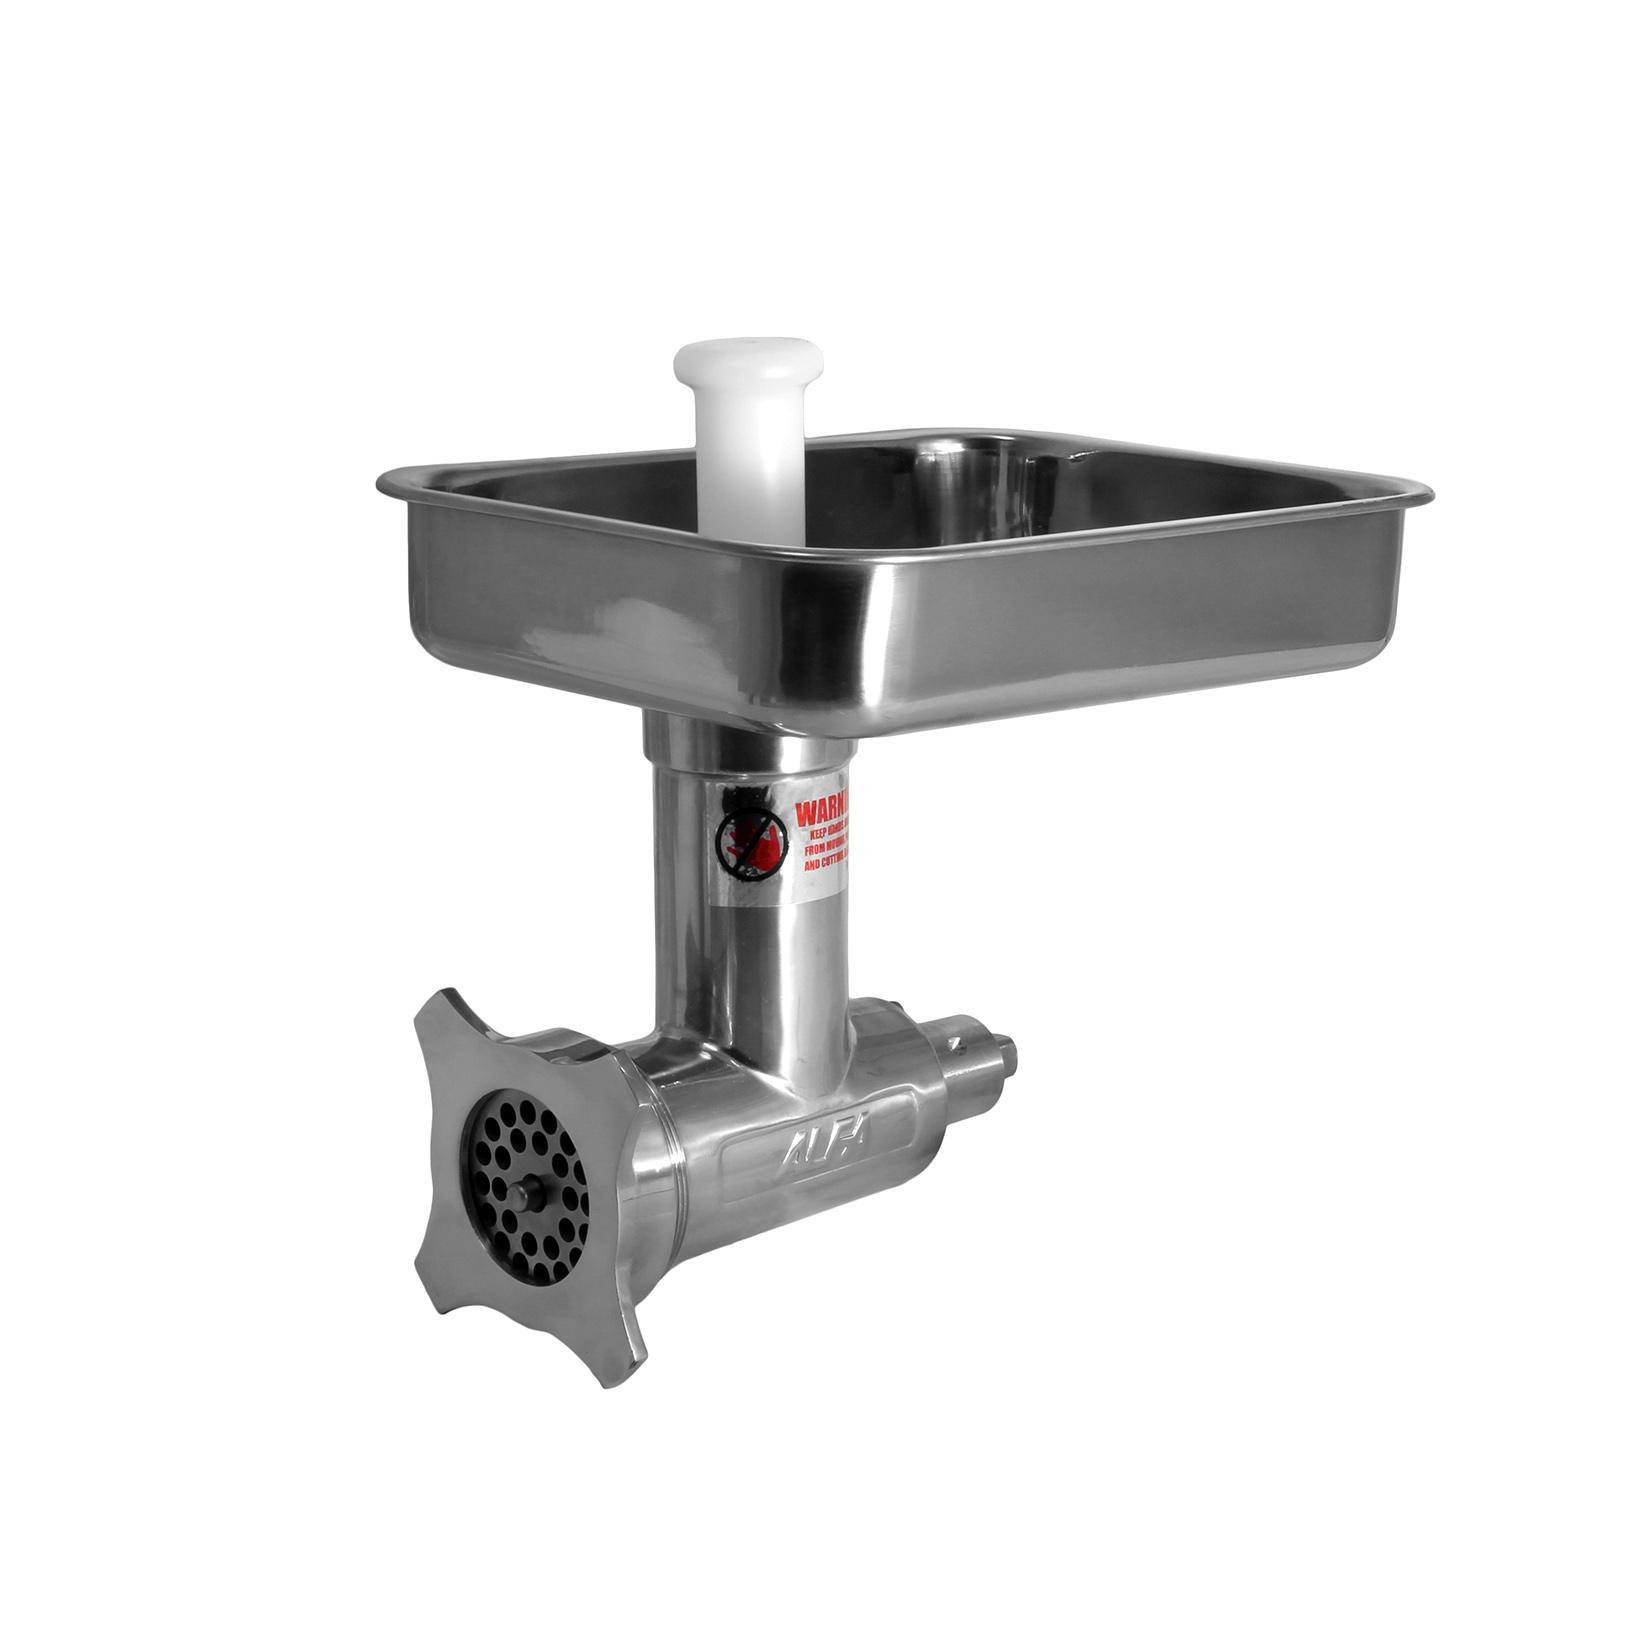 Alfa International 12 SS CCA meat grinder attachment